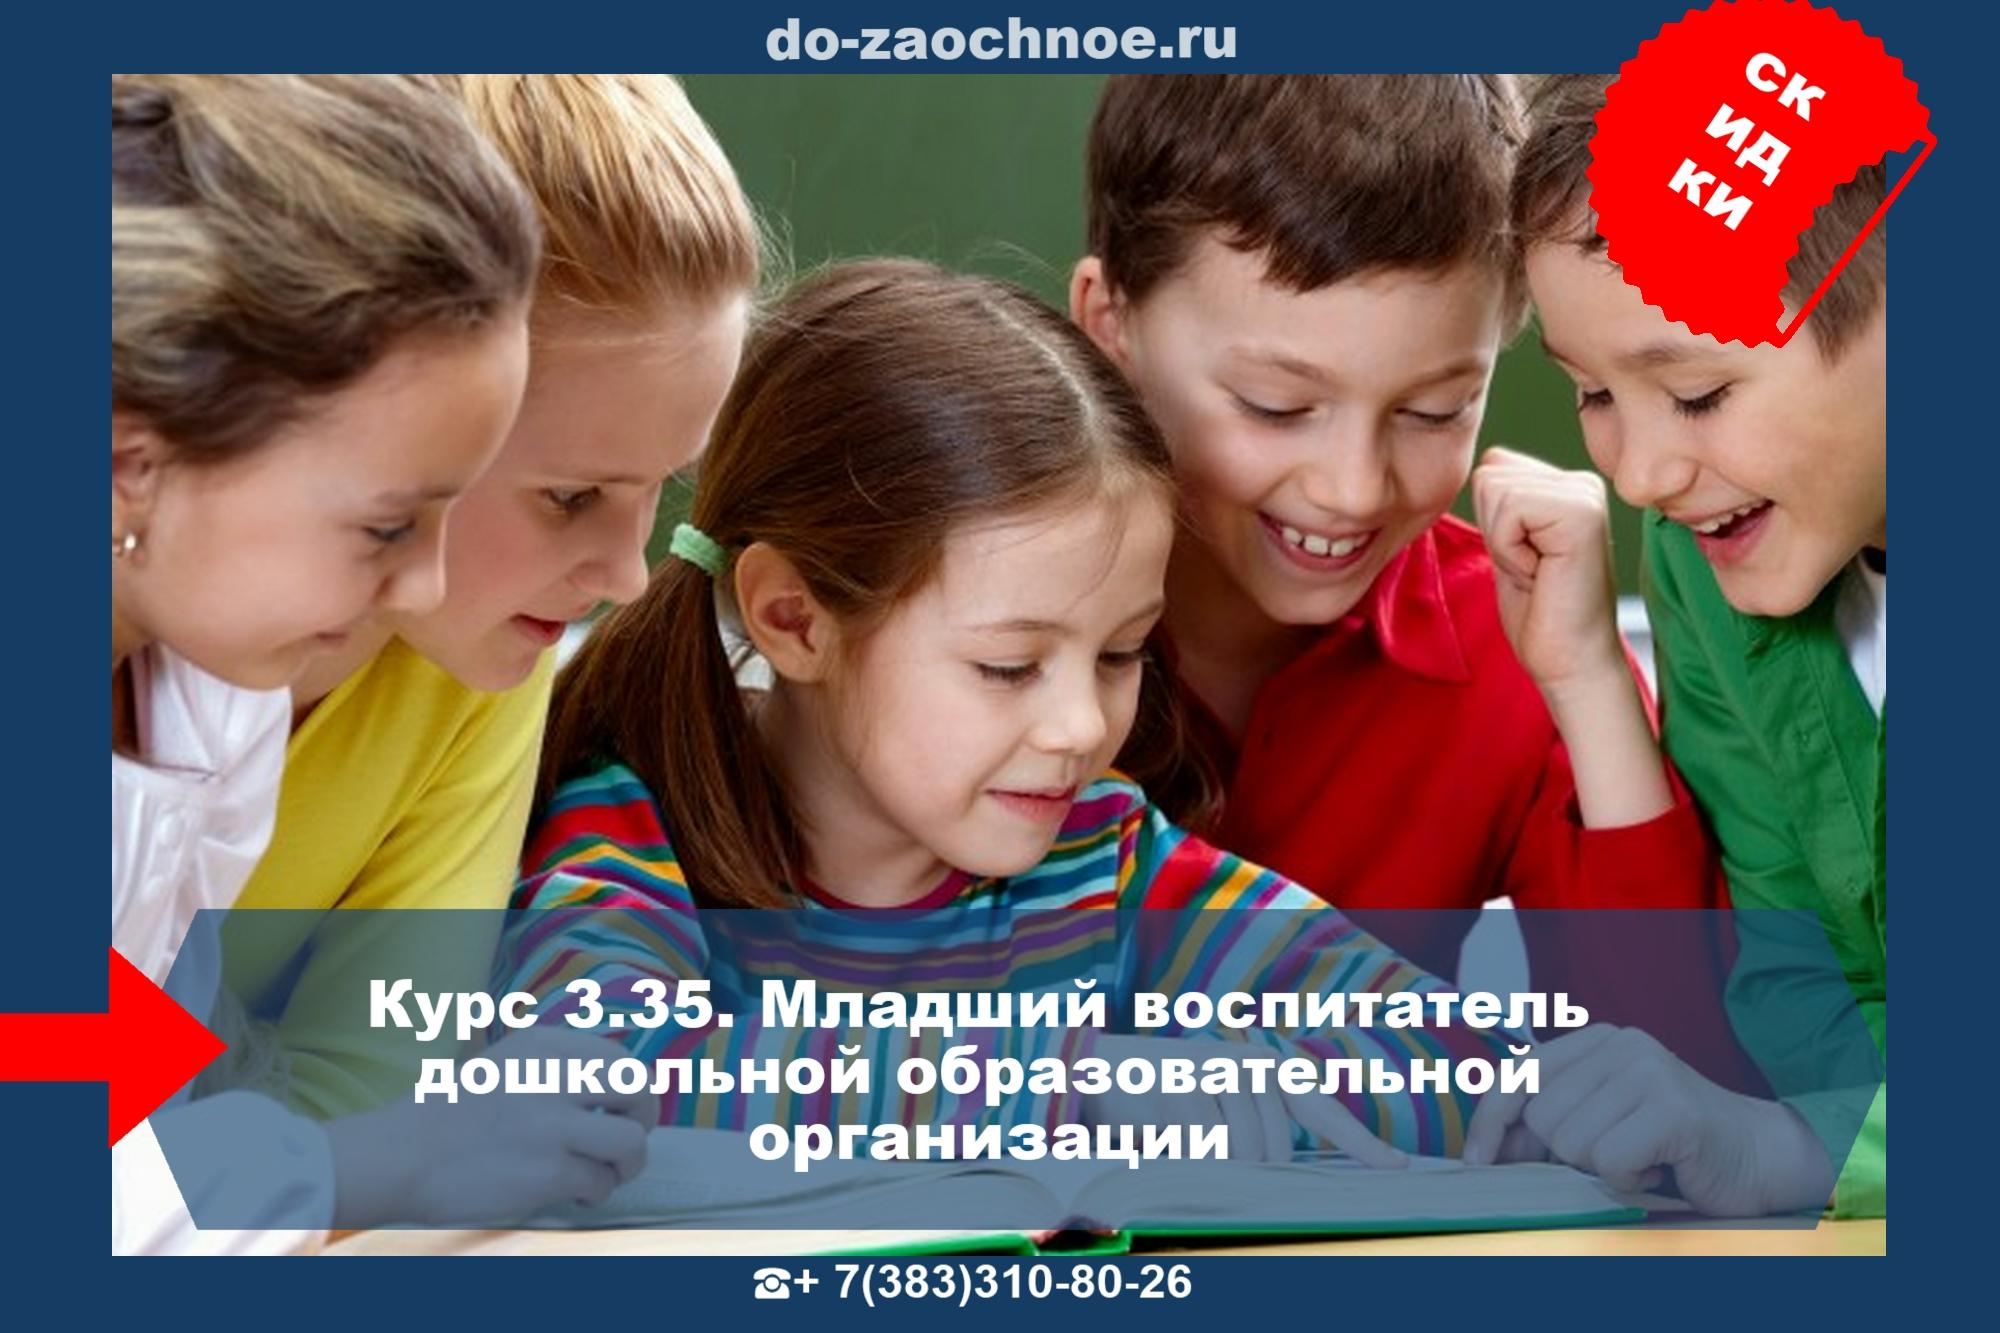 Курс младший воспитатель 3.35